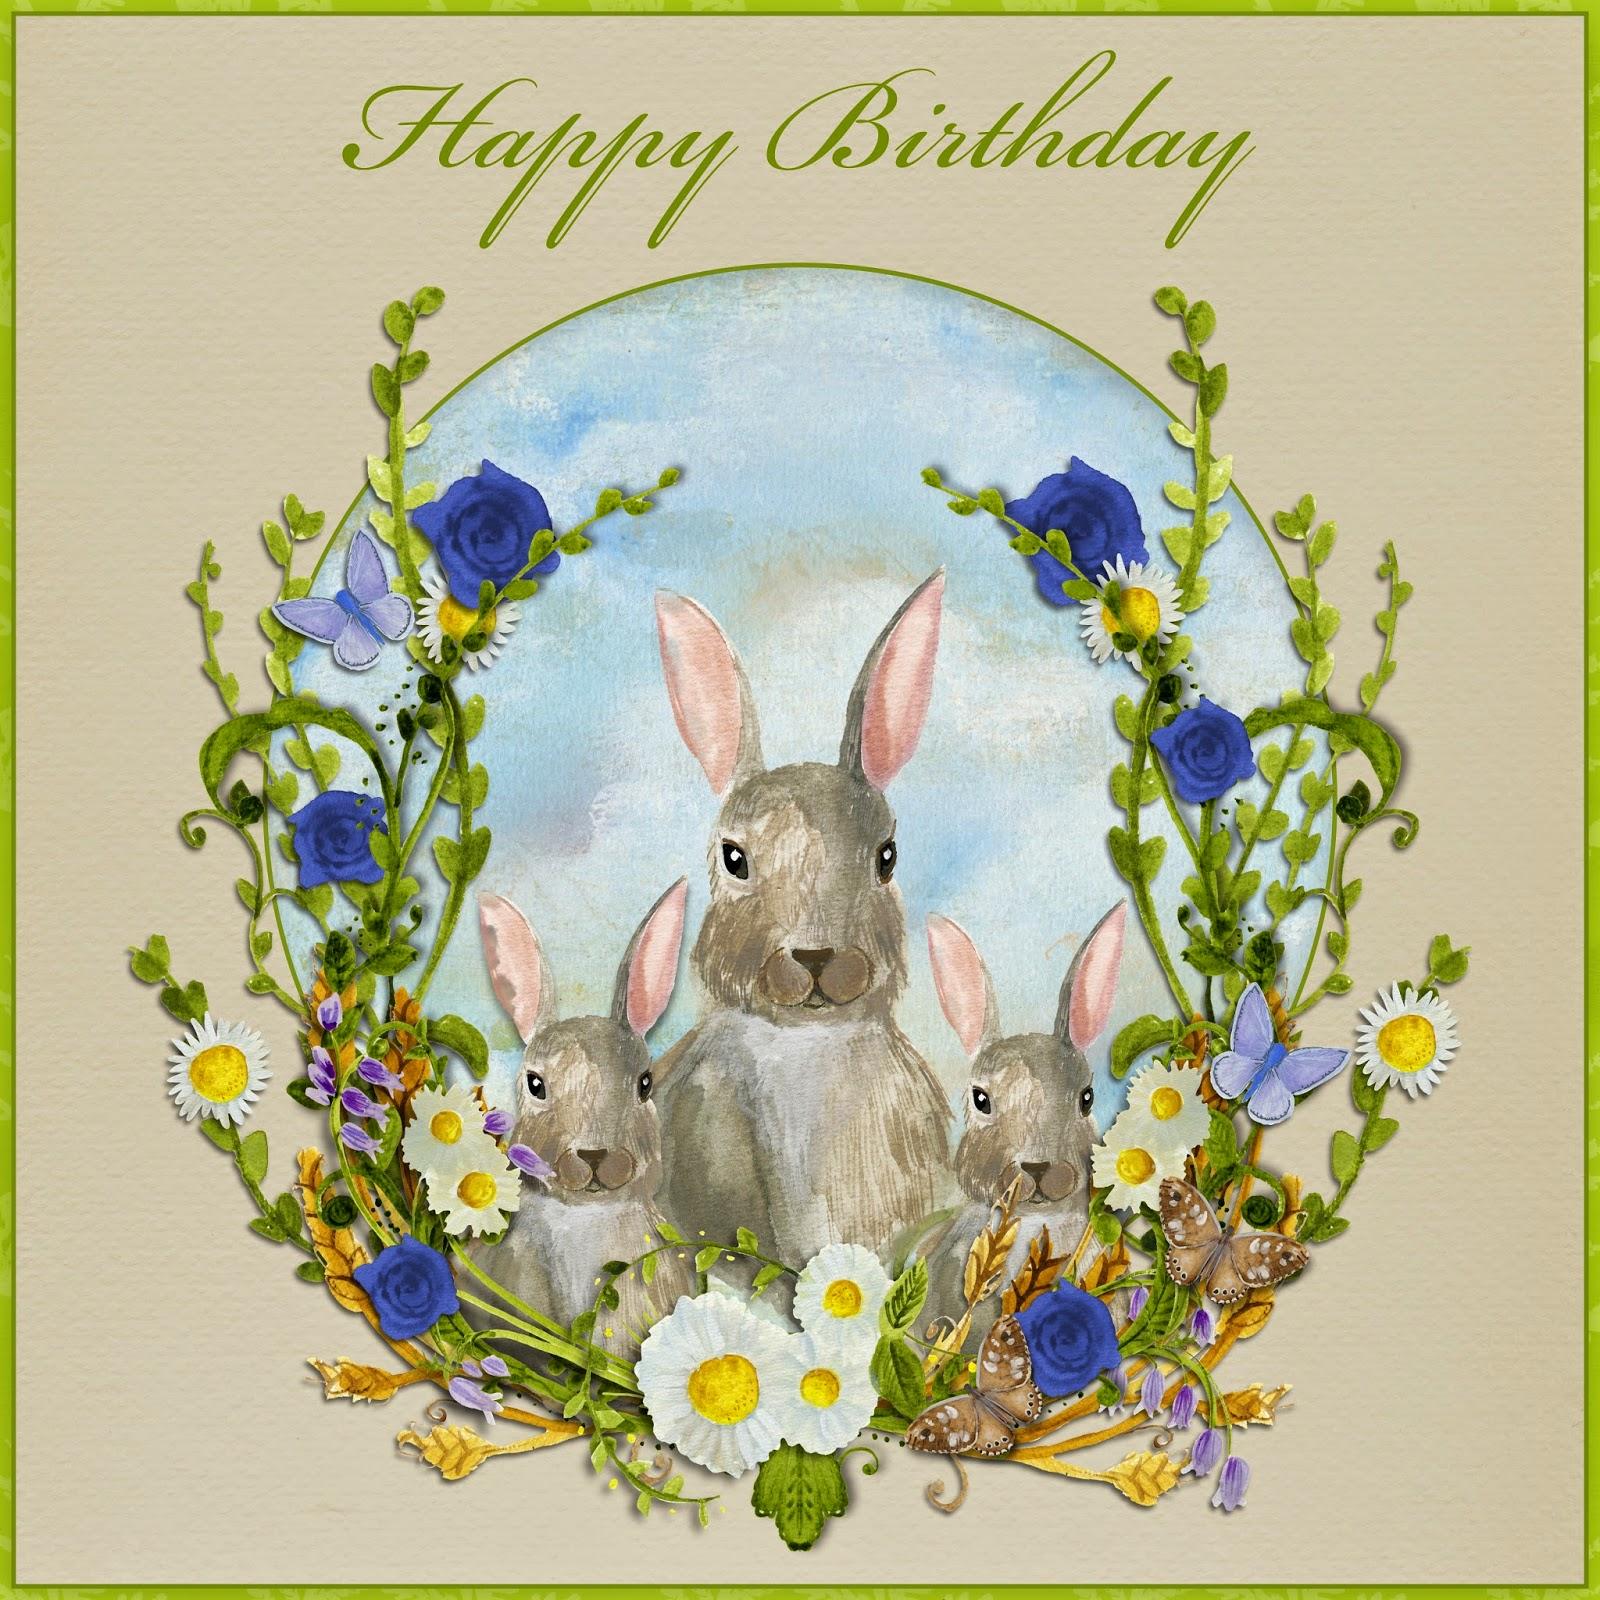 http://4.bp.blogspot.com/-R7we3QACN3Y/U0QiZZumDSI/AAAAAAAAFSc/2ToxROJkl0g/s1600/WoodlandWalk_BirthdayCard_Algera.jpg